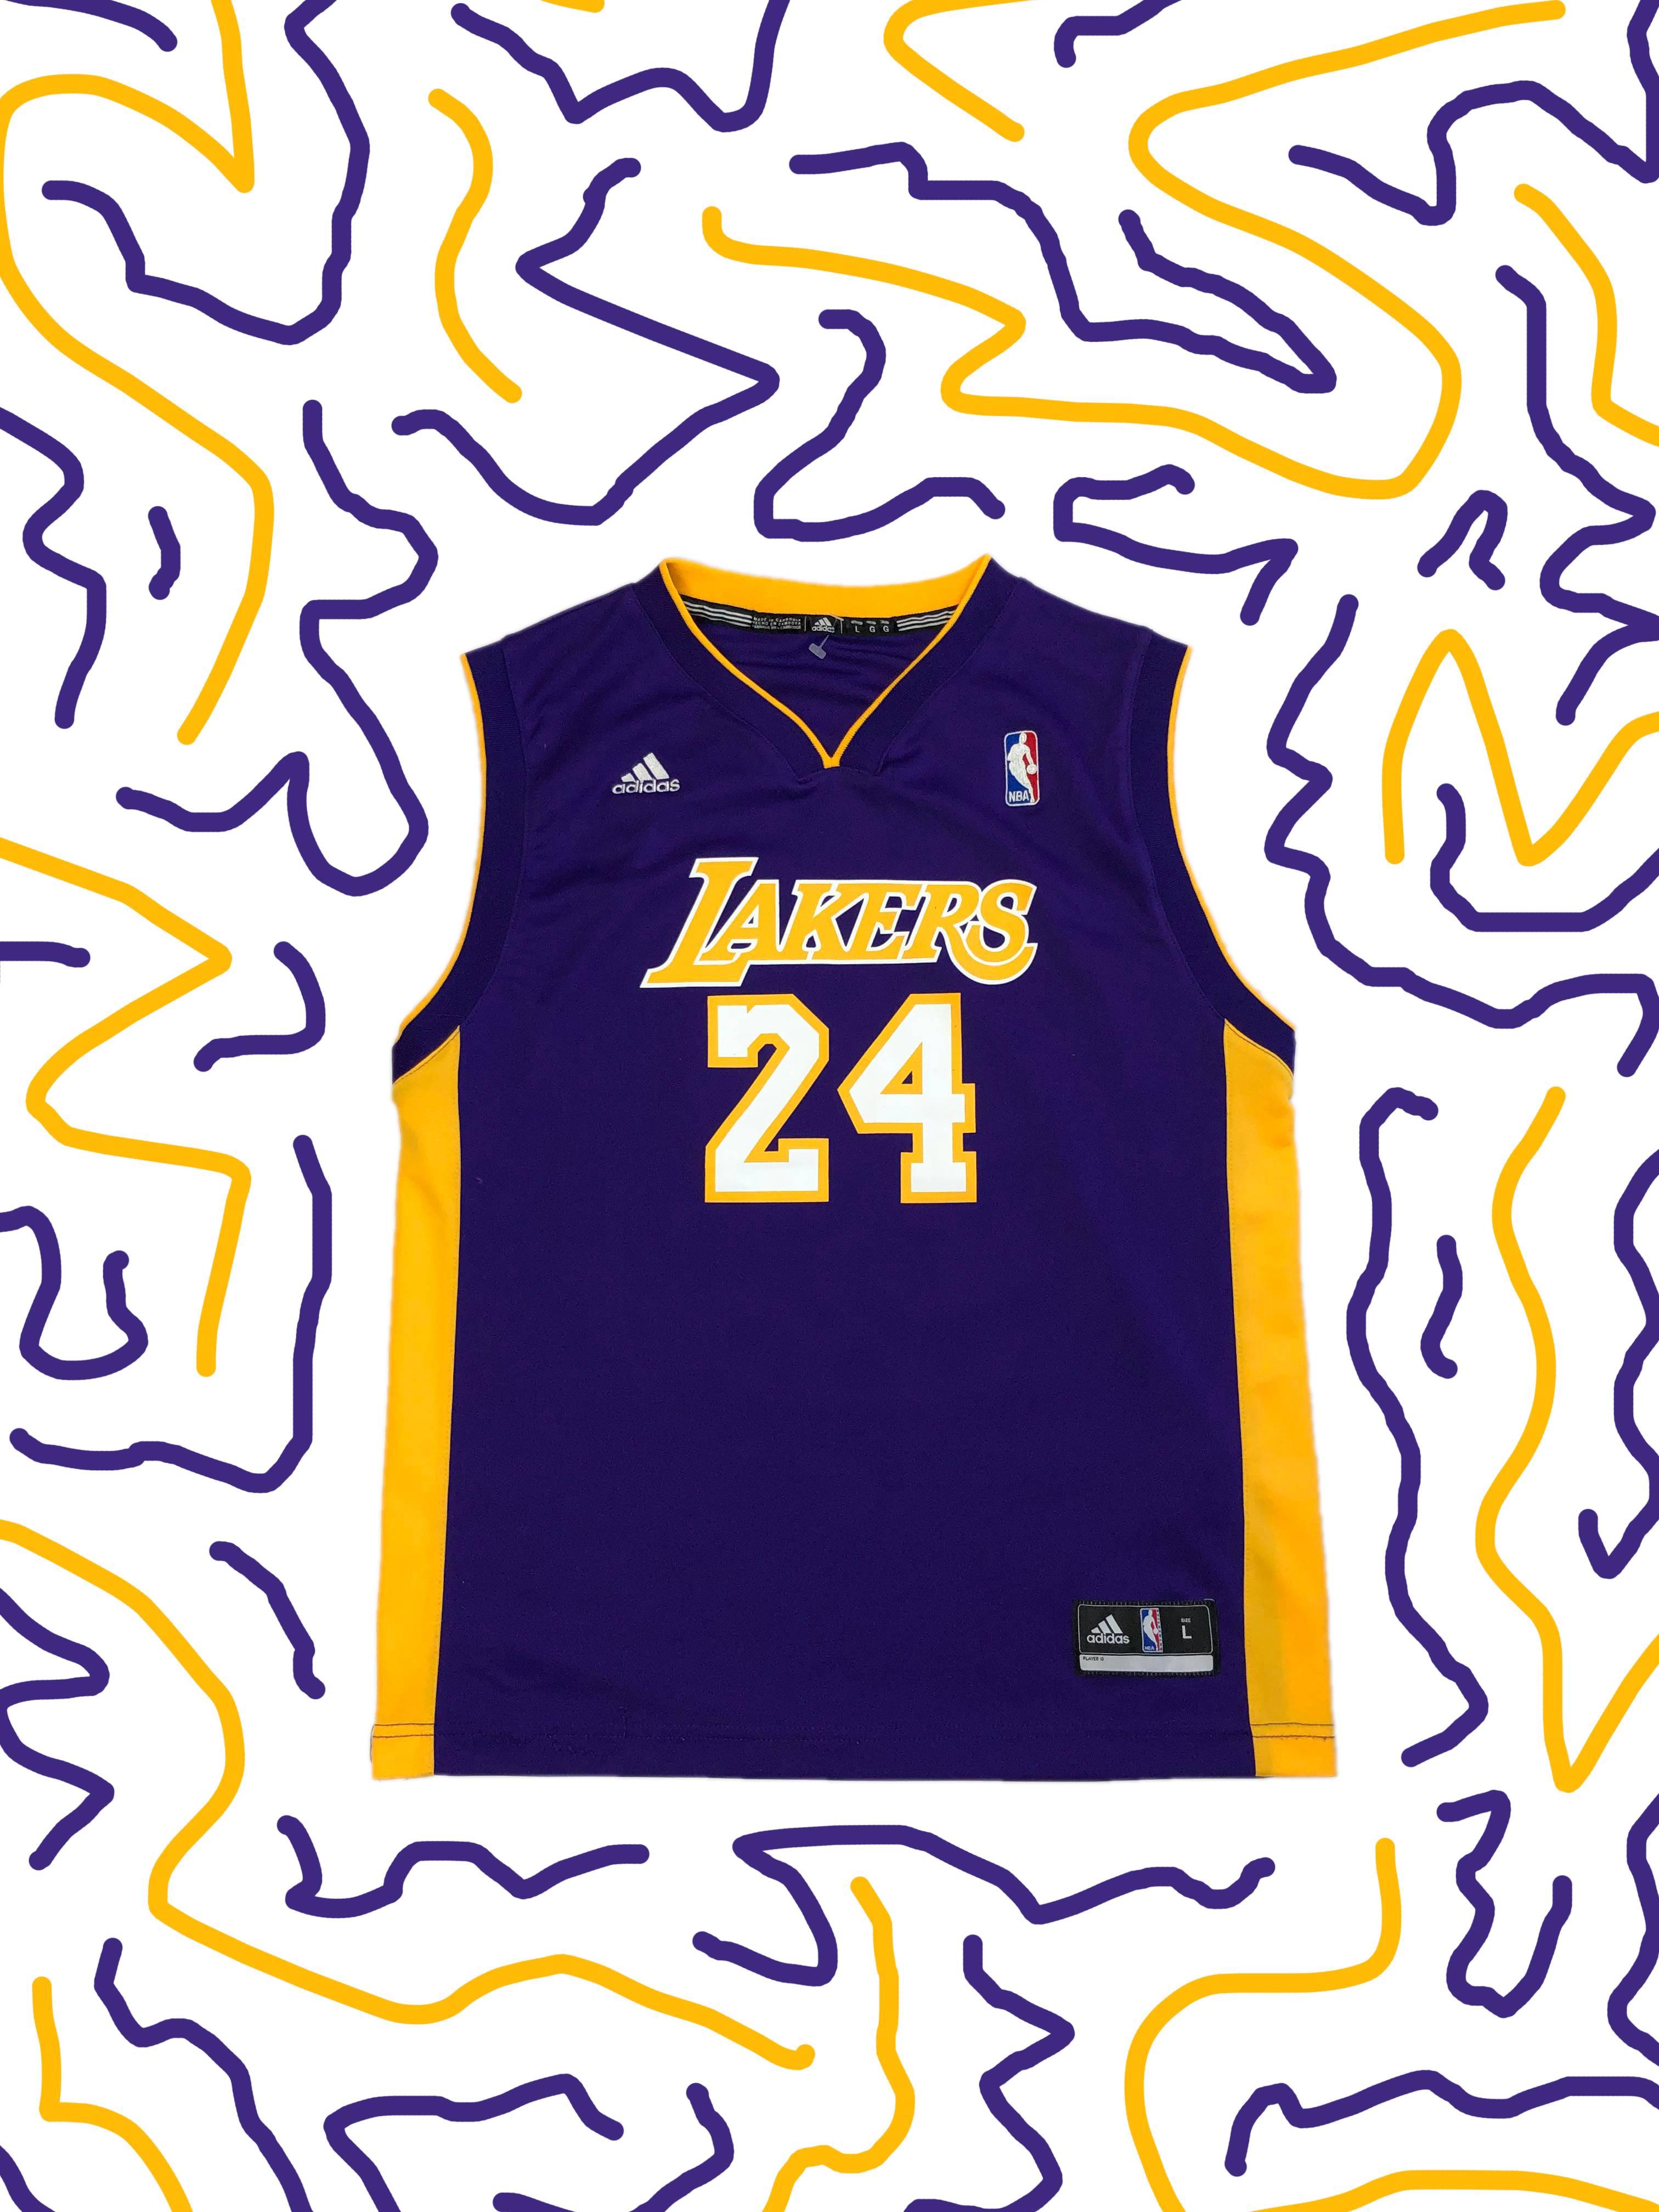 Adidas Kobe Bryant Jersey Los Angeles Lakers Adidas Jersey NBA #24